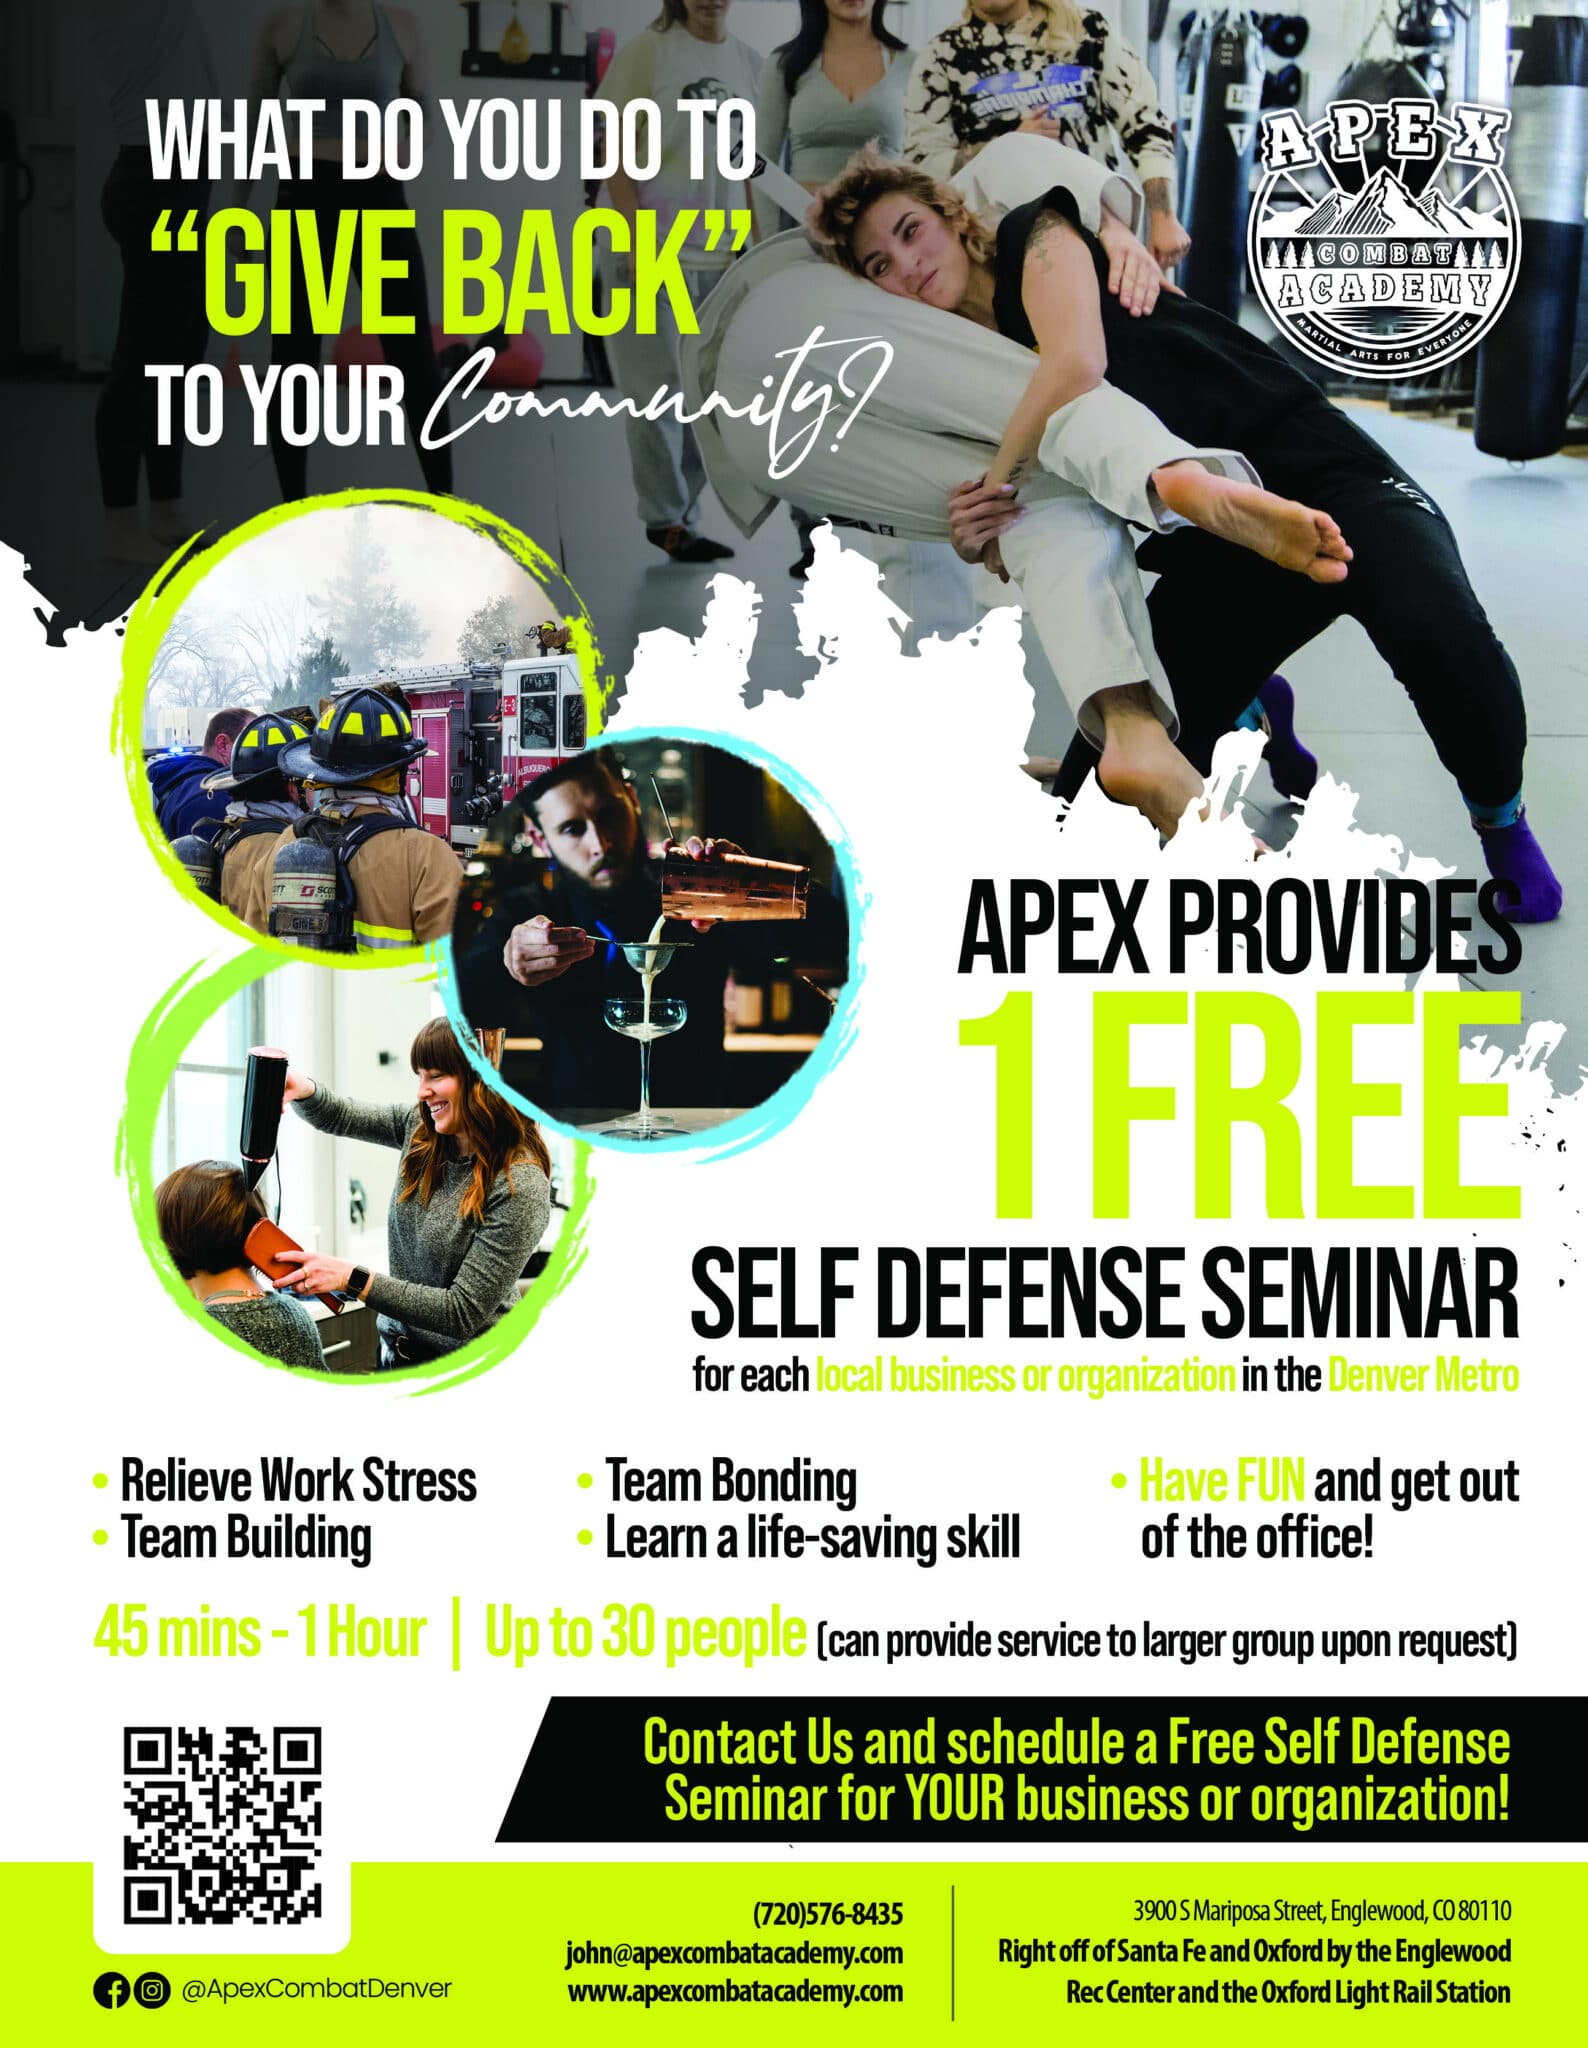 Apex Combat Academy Business Self-Defense Seminar